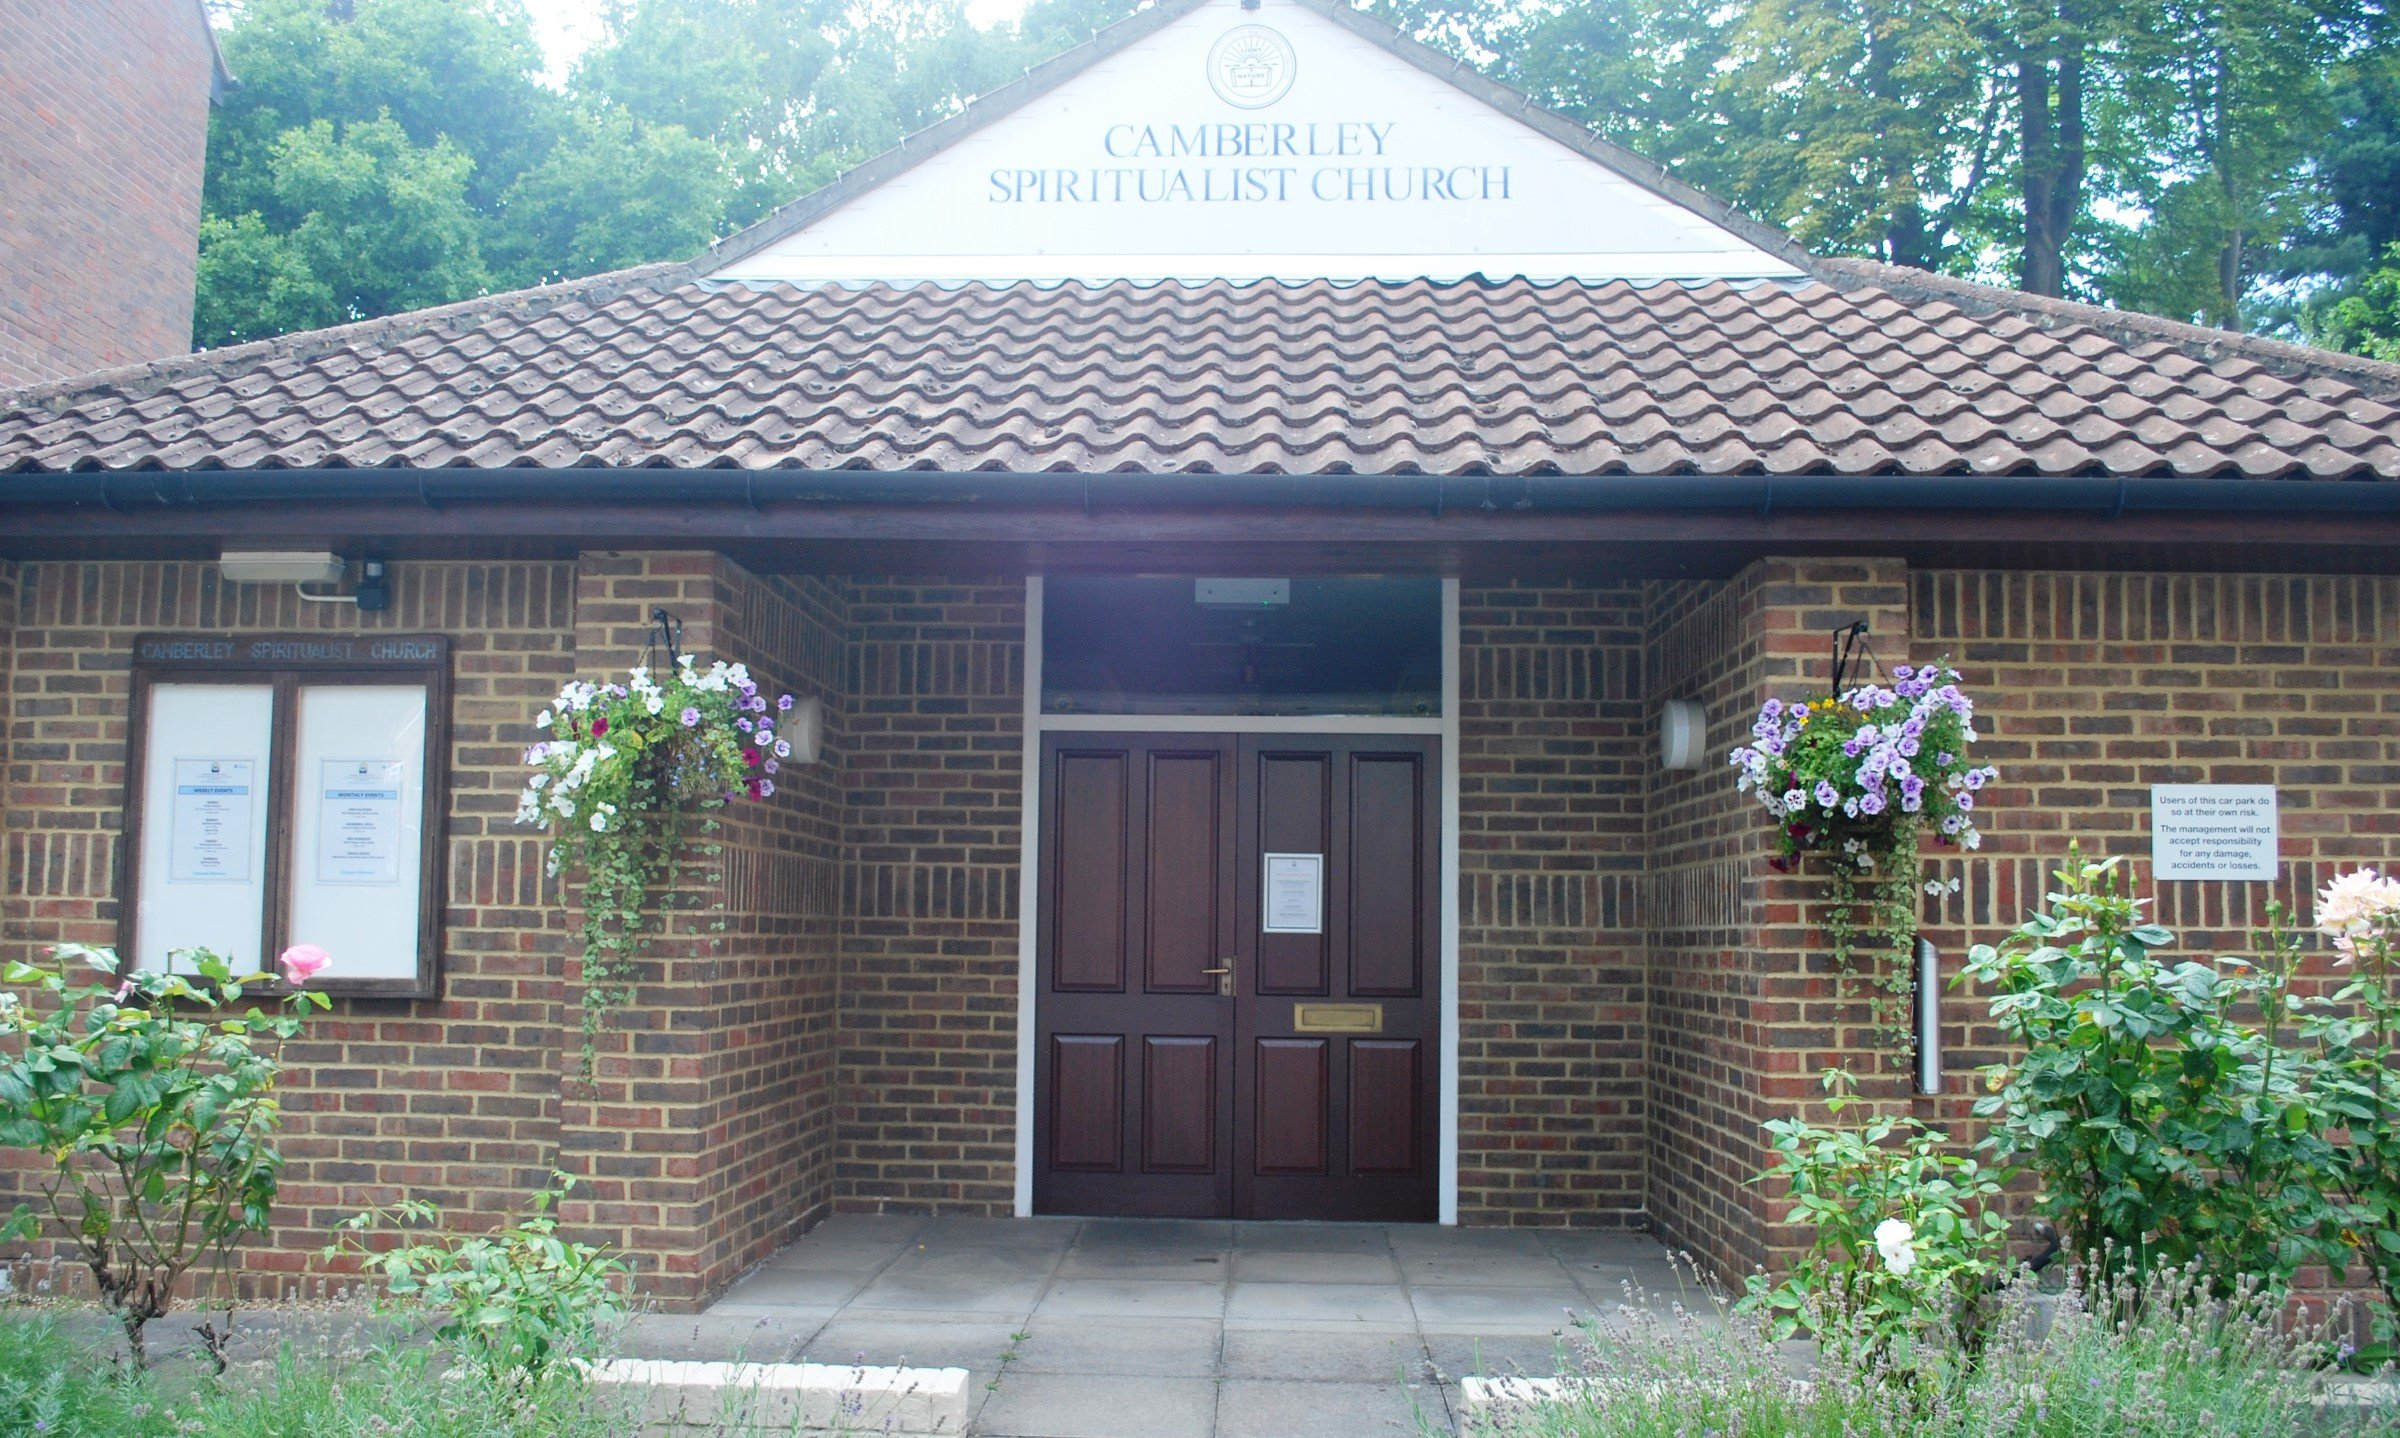 Camberley Spiritualist Church